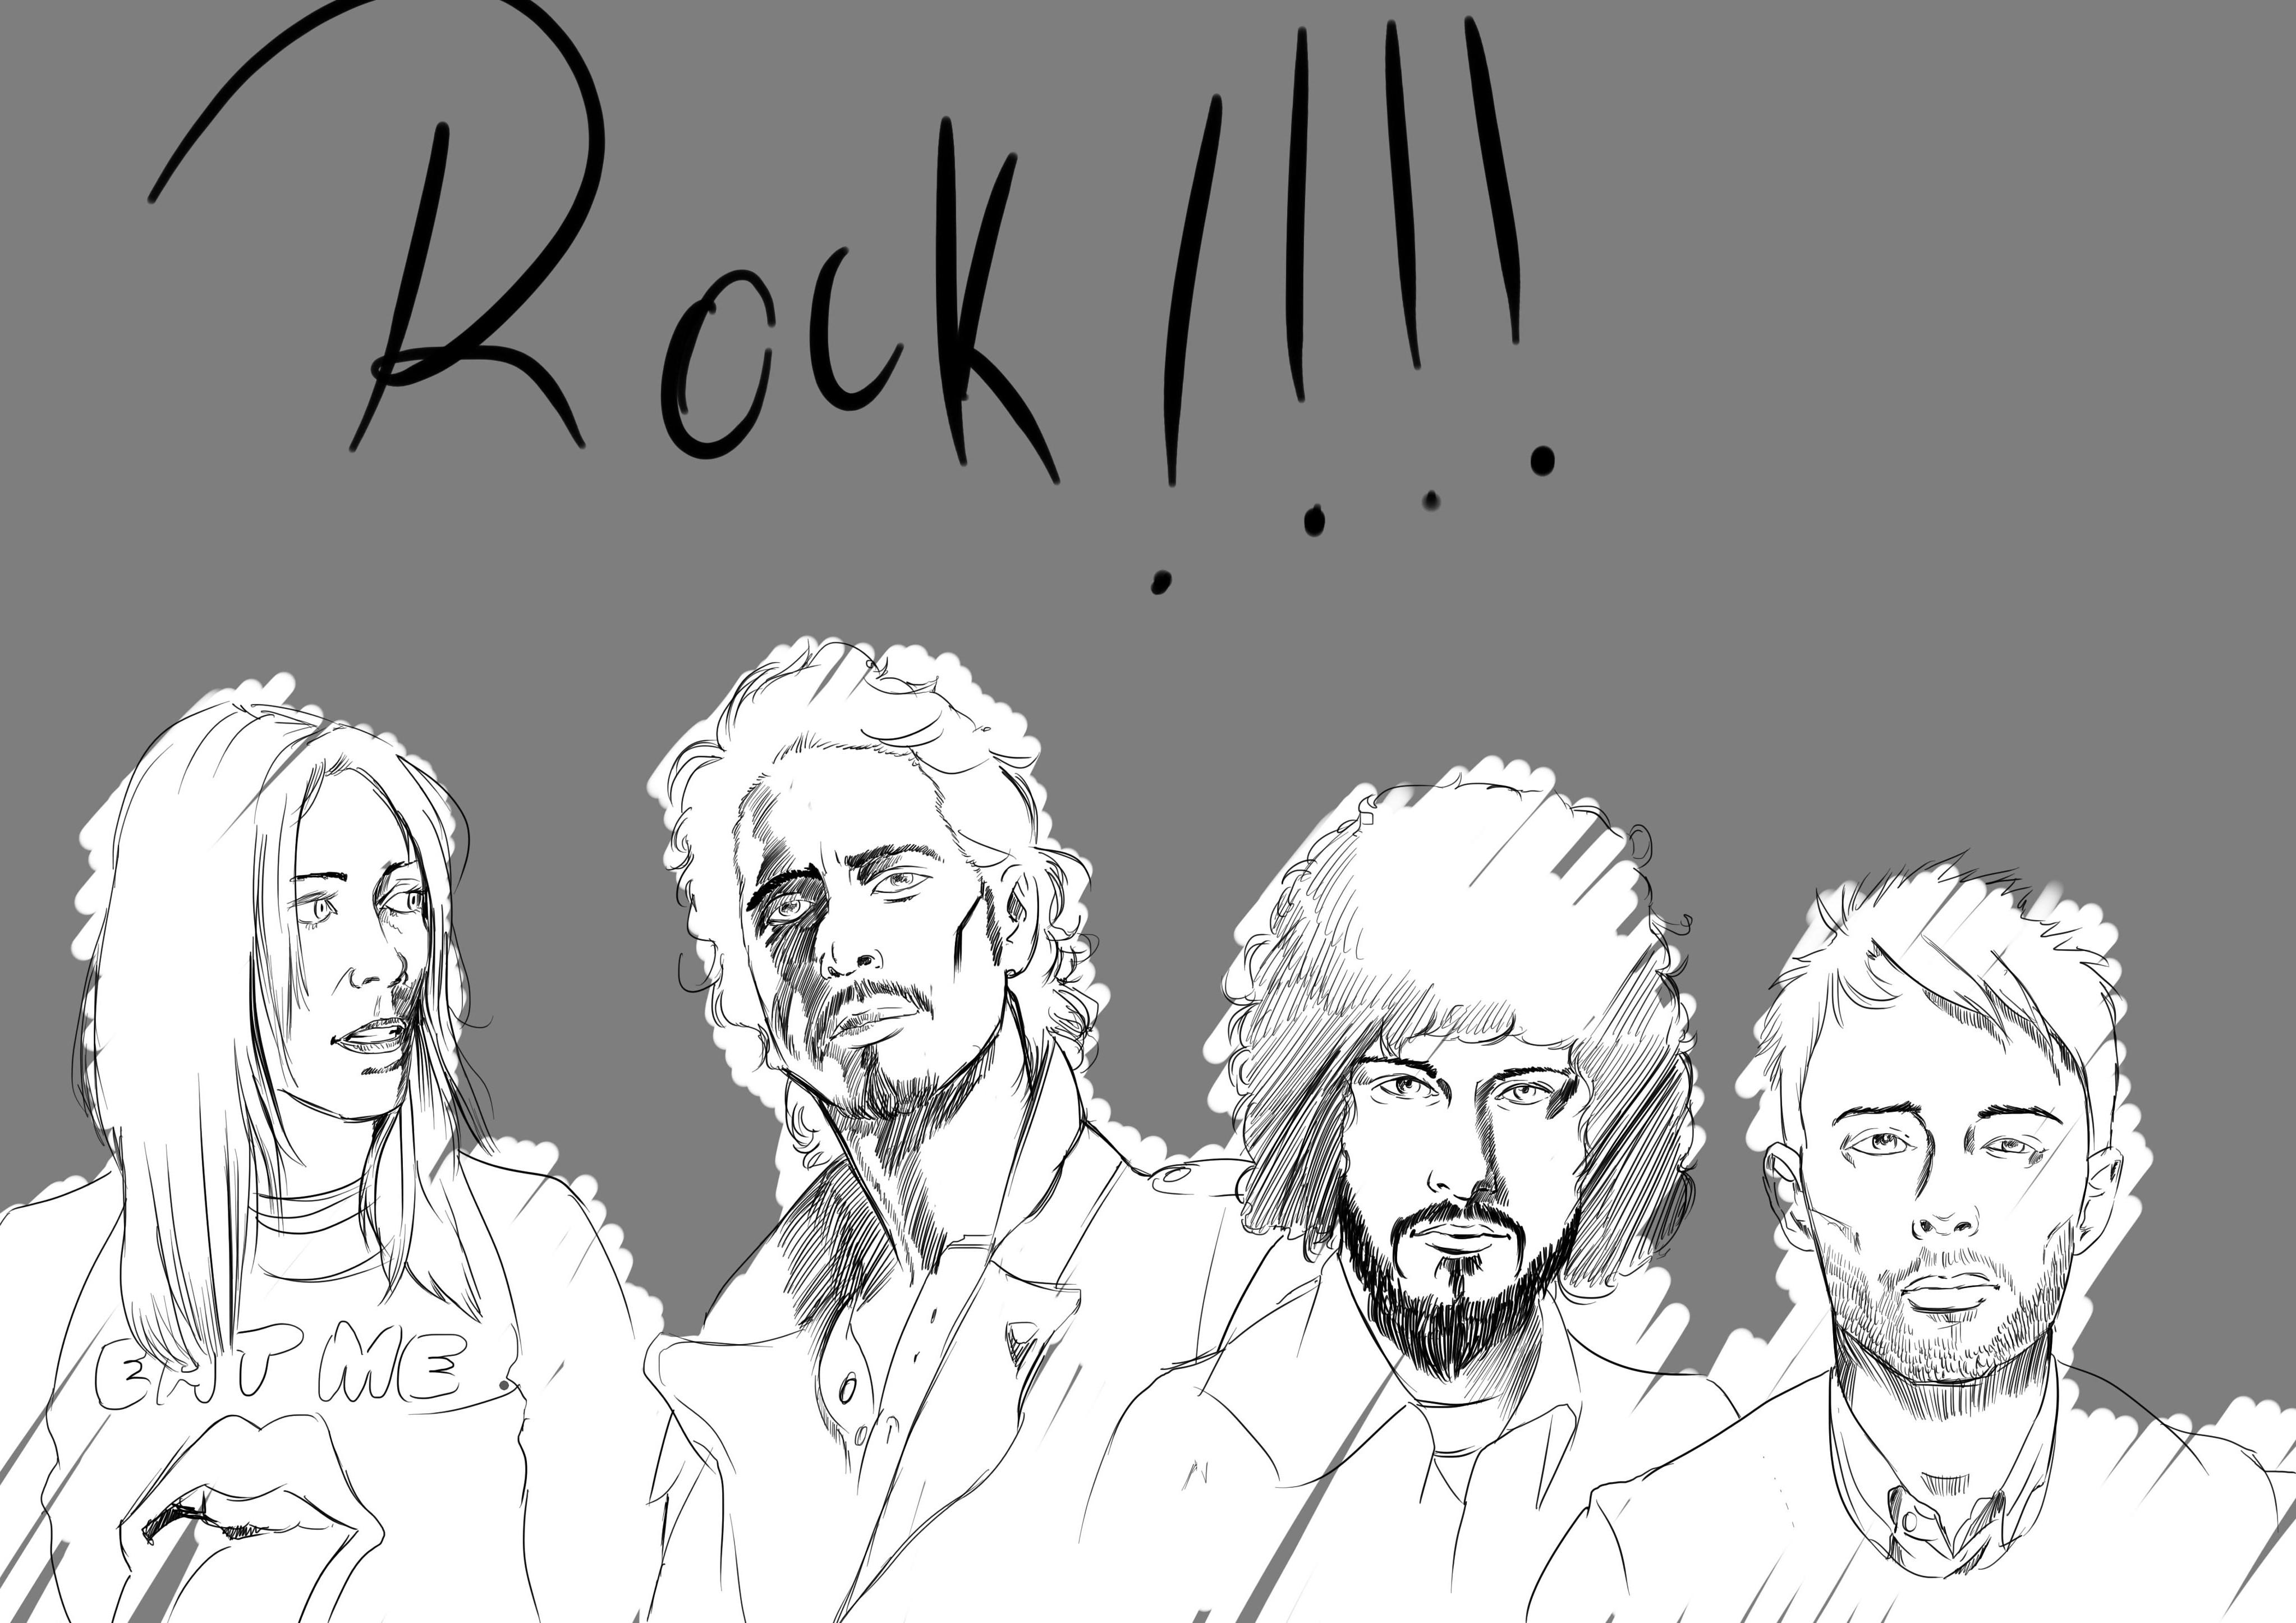 rocker stars